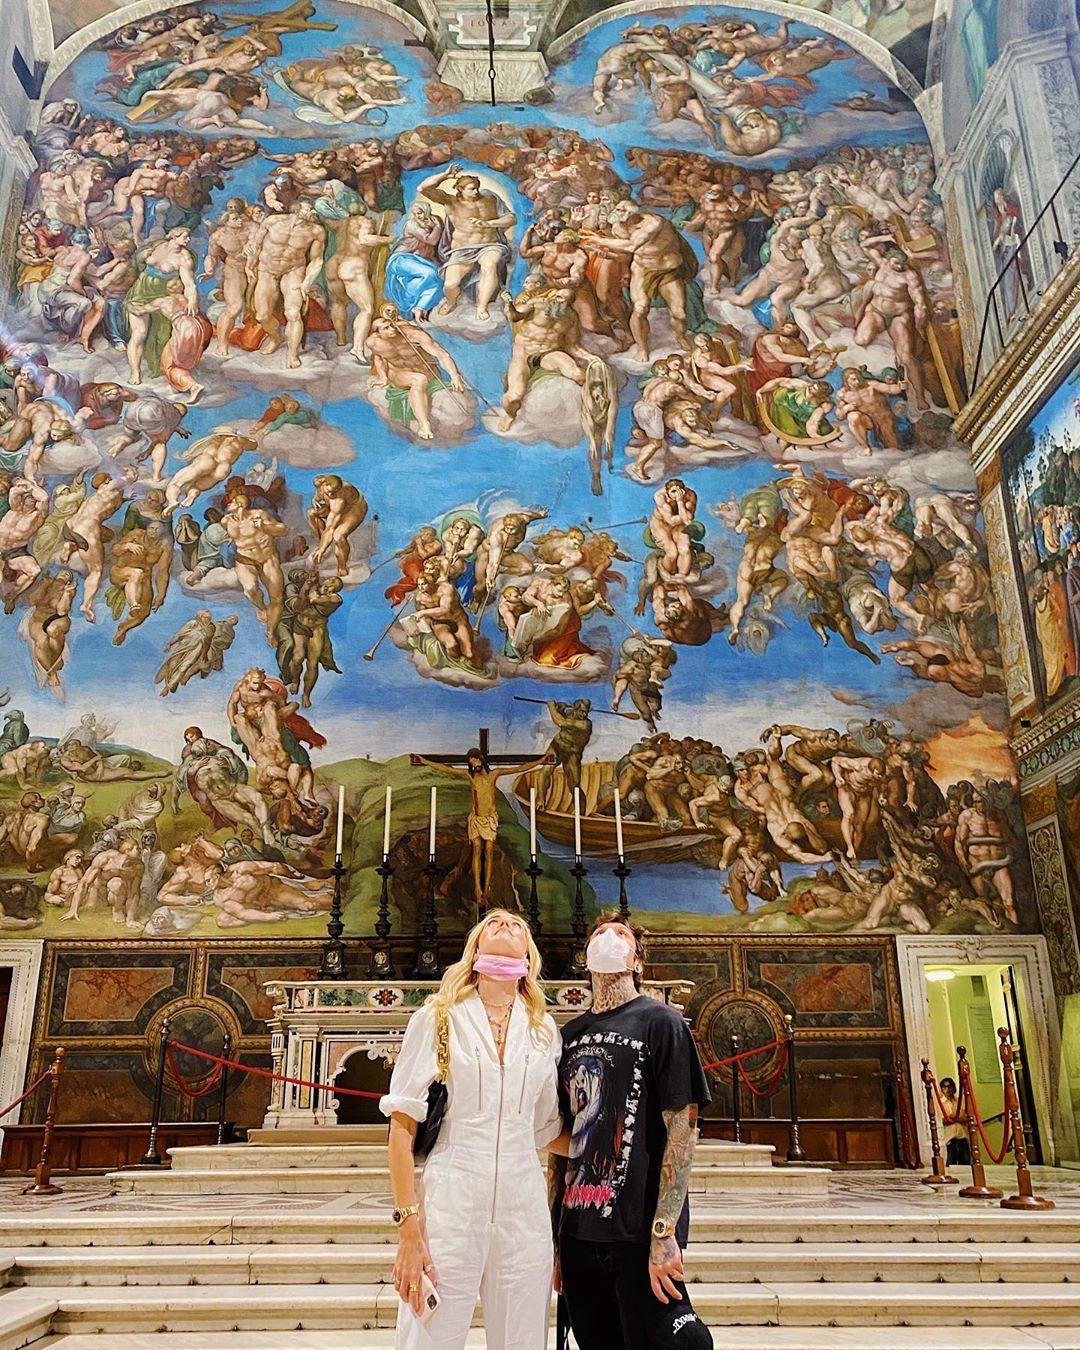 Ferragnez ai musei vaticani - neomag.